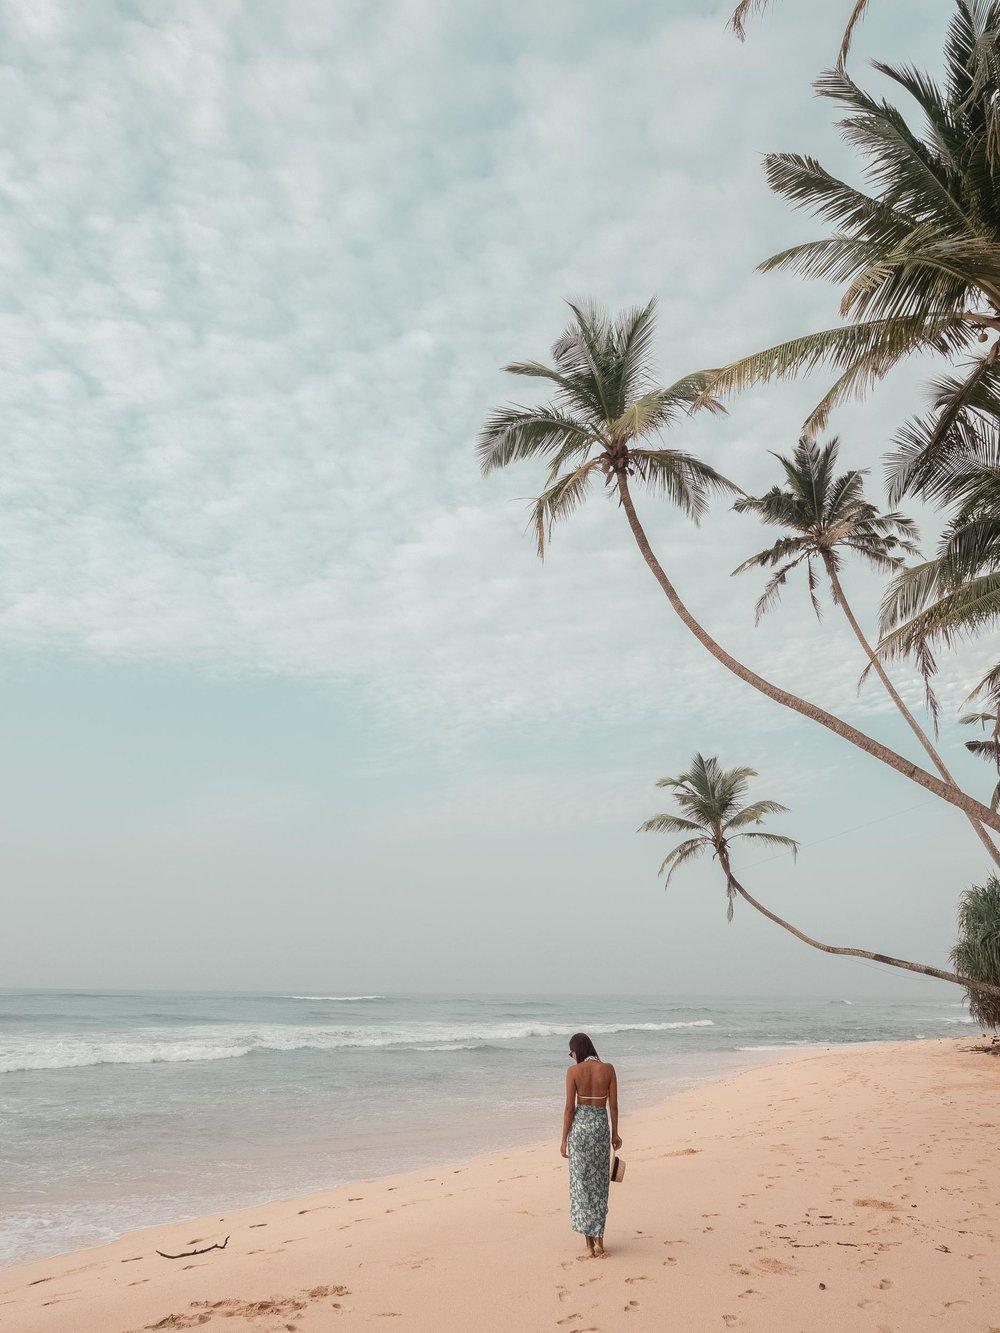 Unanwatuna_Beach_Sri_Lanka.jpg